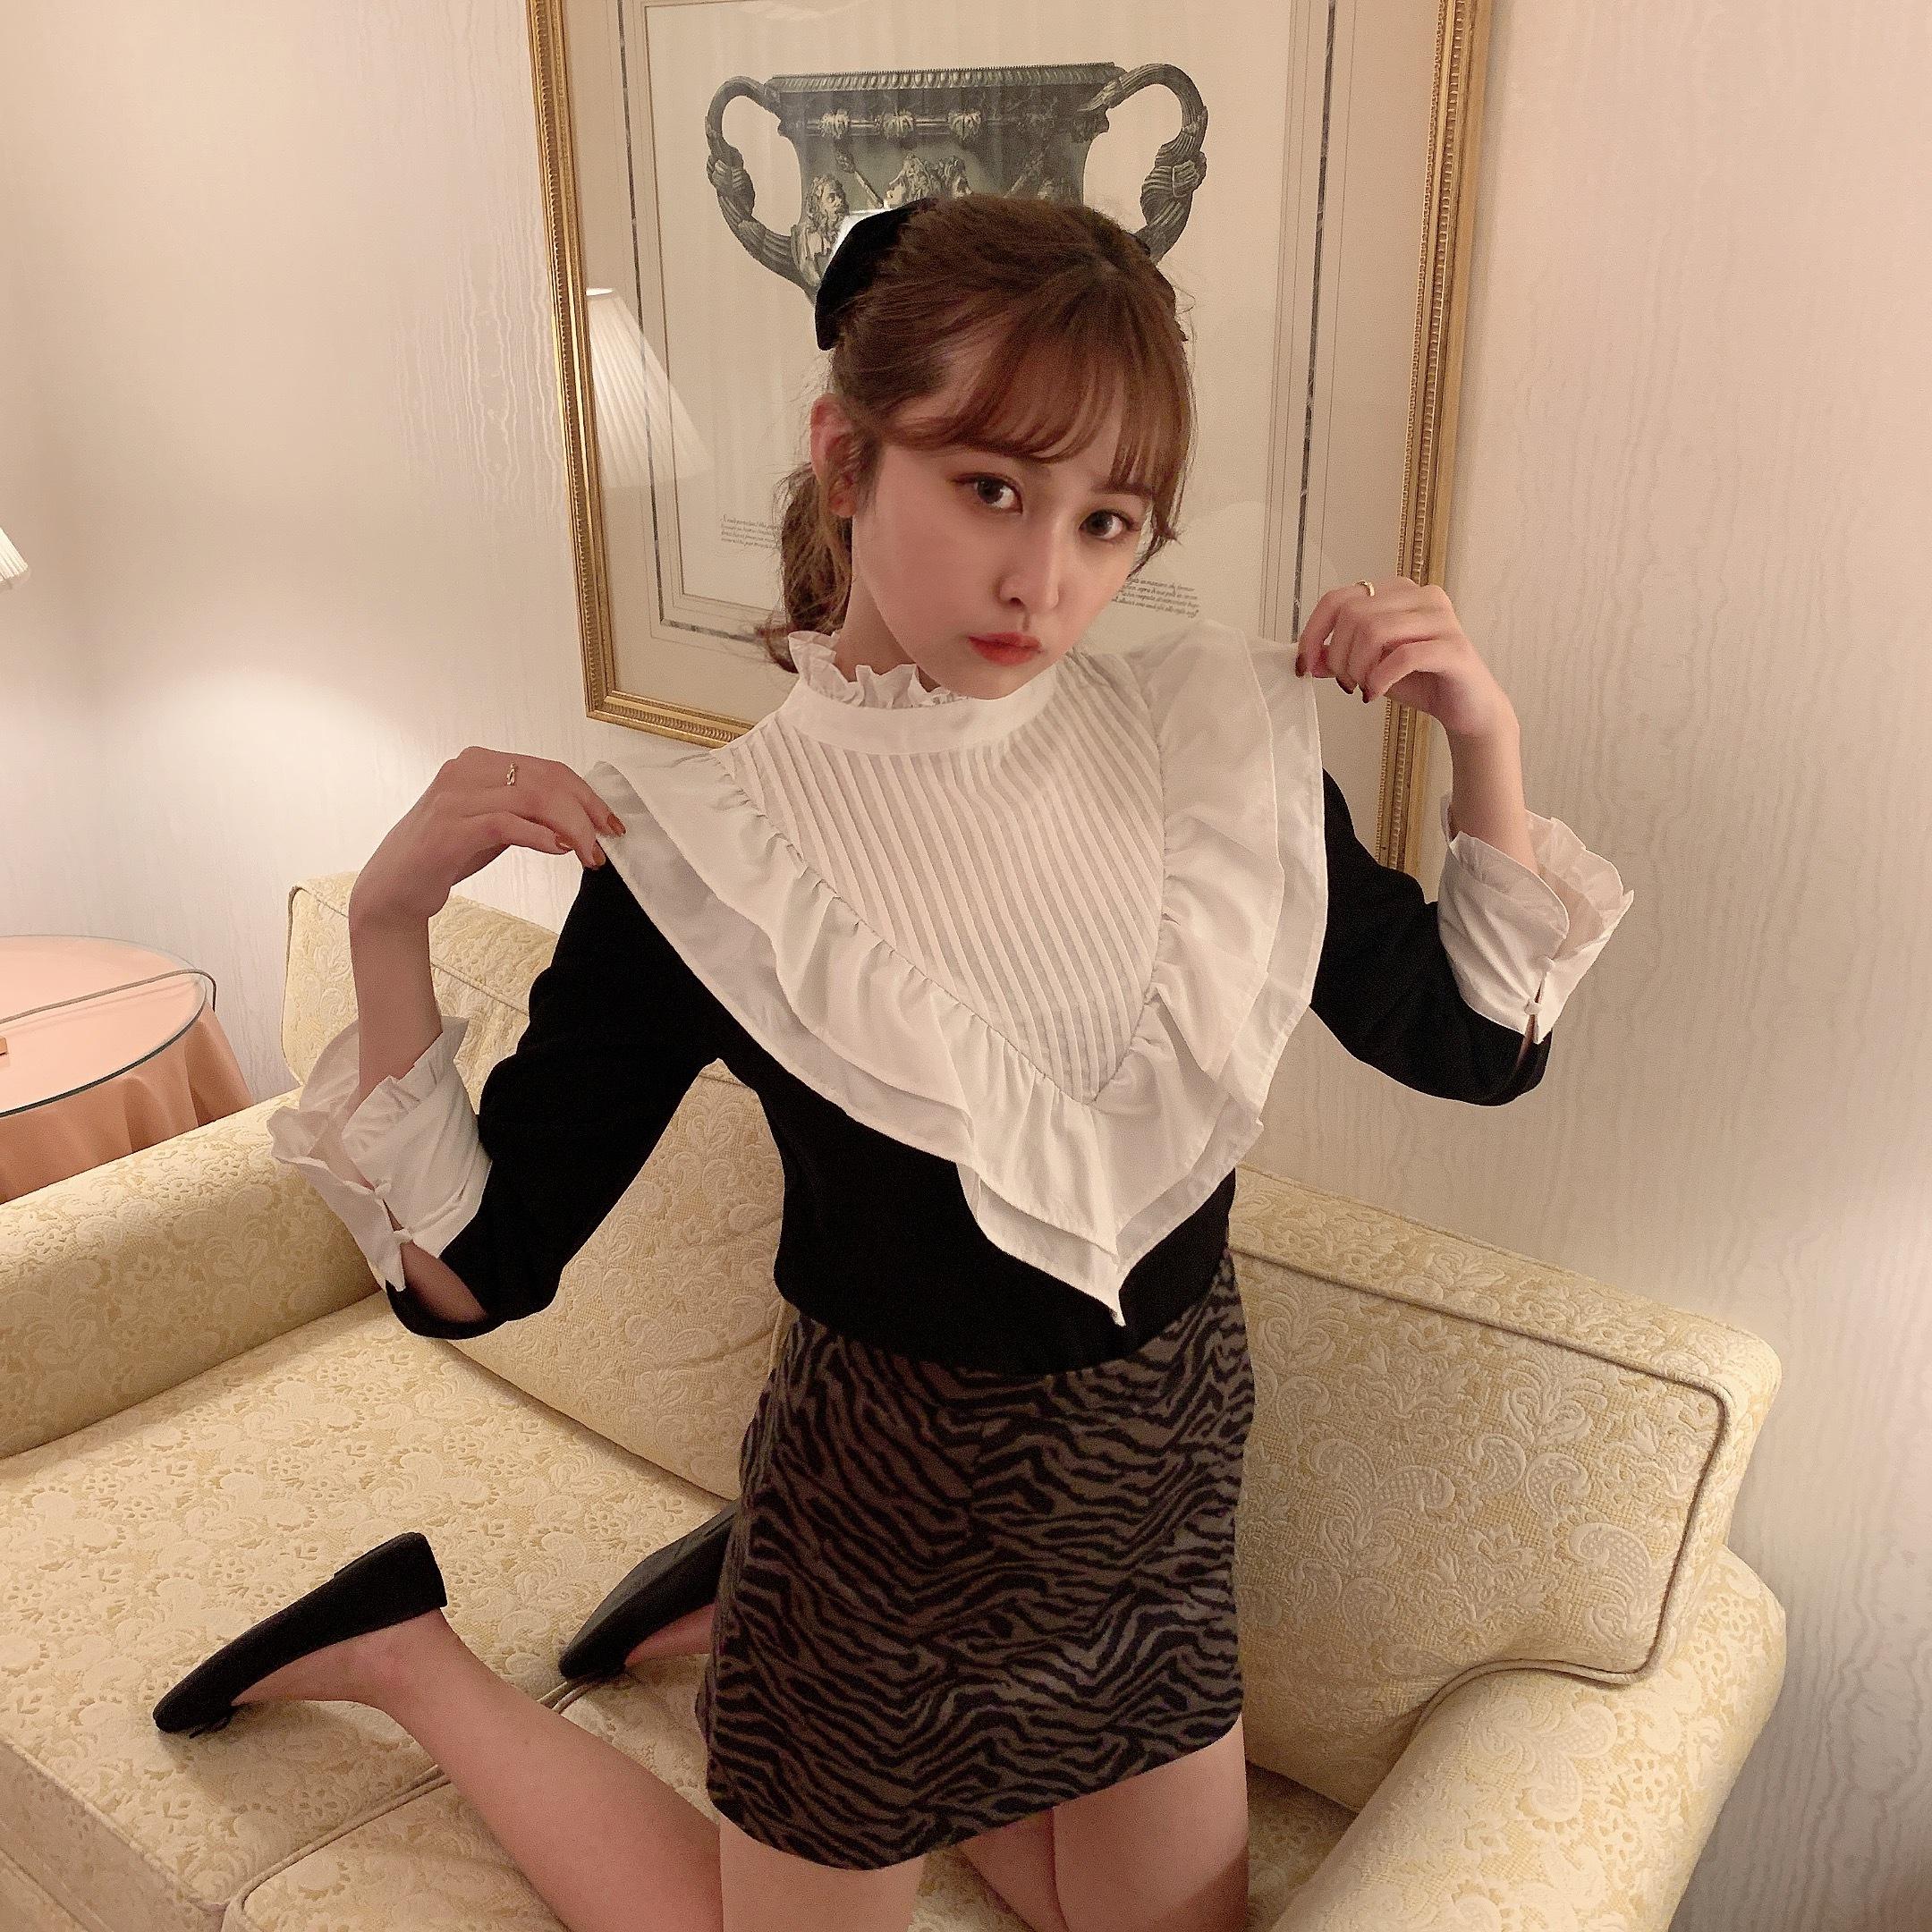 【RESTOCK】Désir original parfait docking blouse